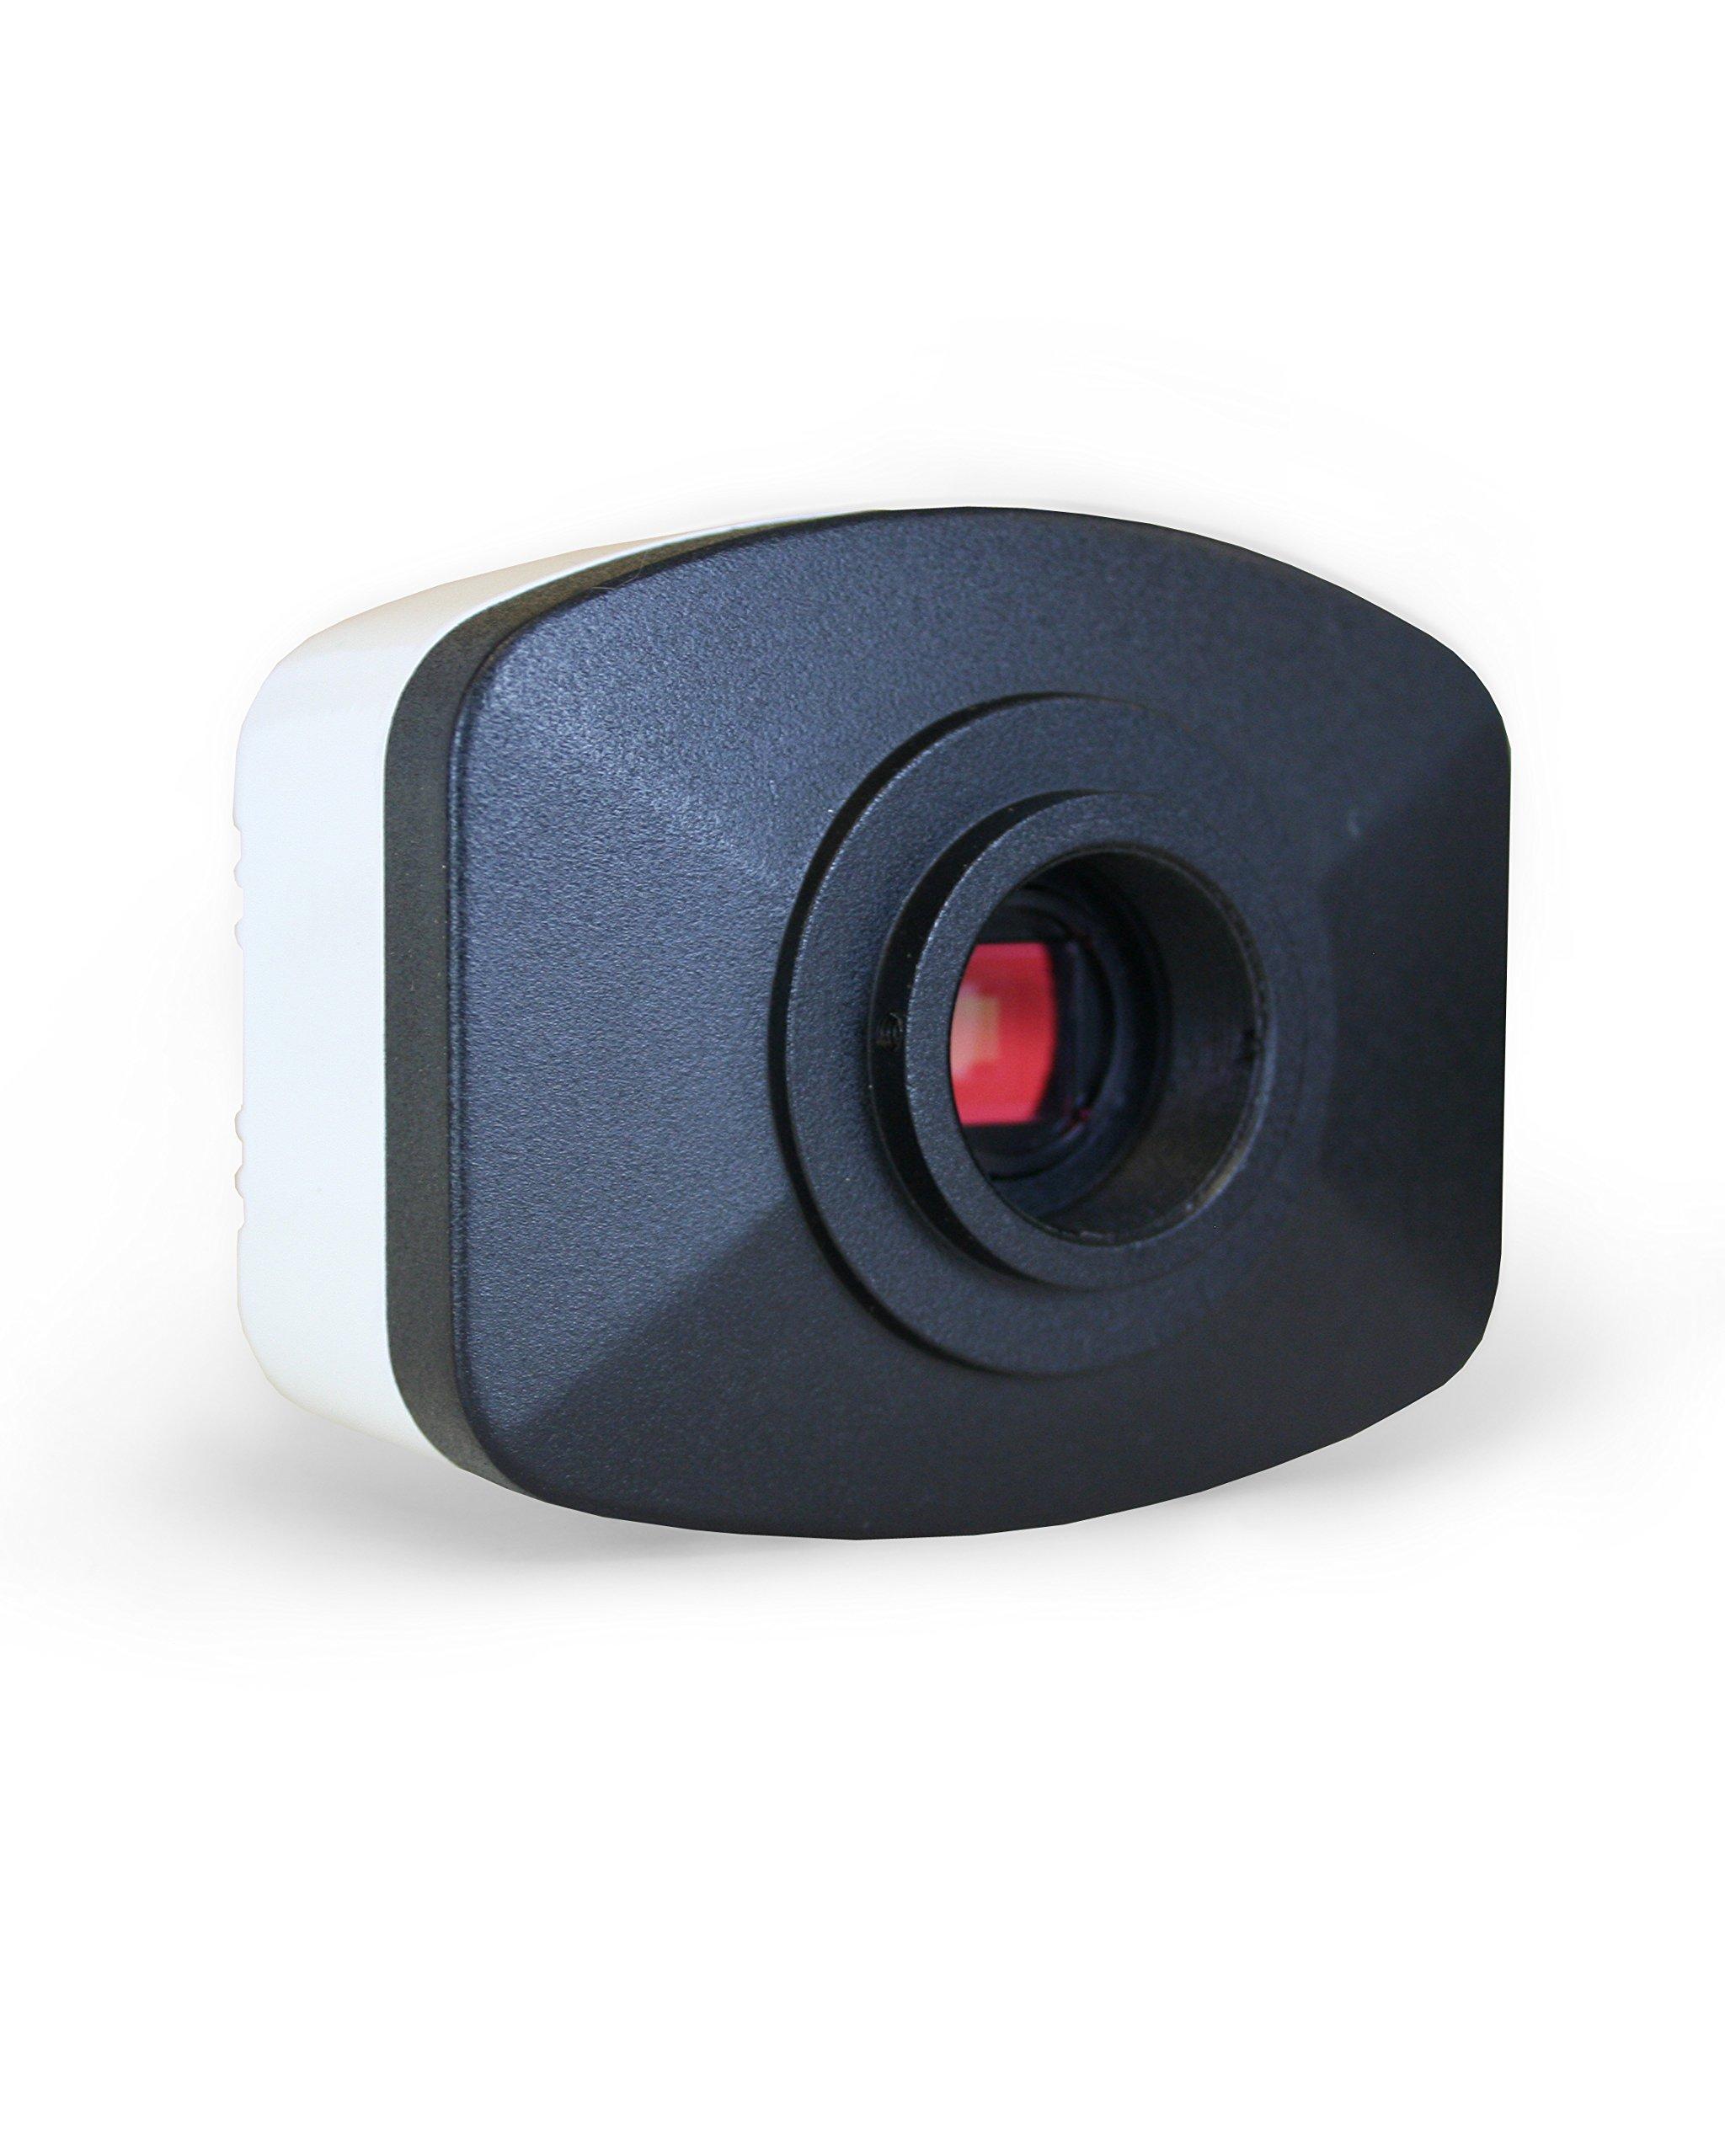 Vision Scientific VDN013 DN Pro Microscope Eyepiece Camera 1.3 MP Windows XP/7/8; Linux; Mac; USB 2.0